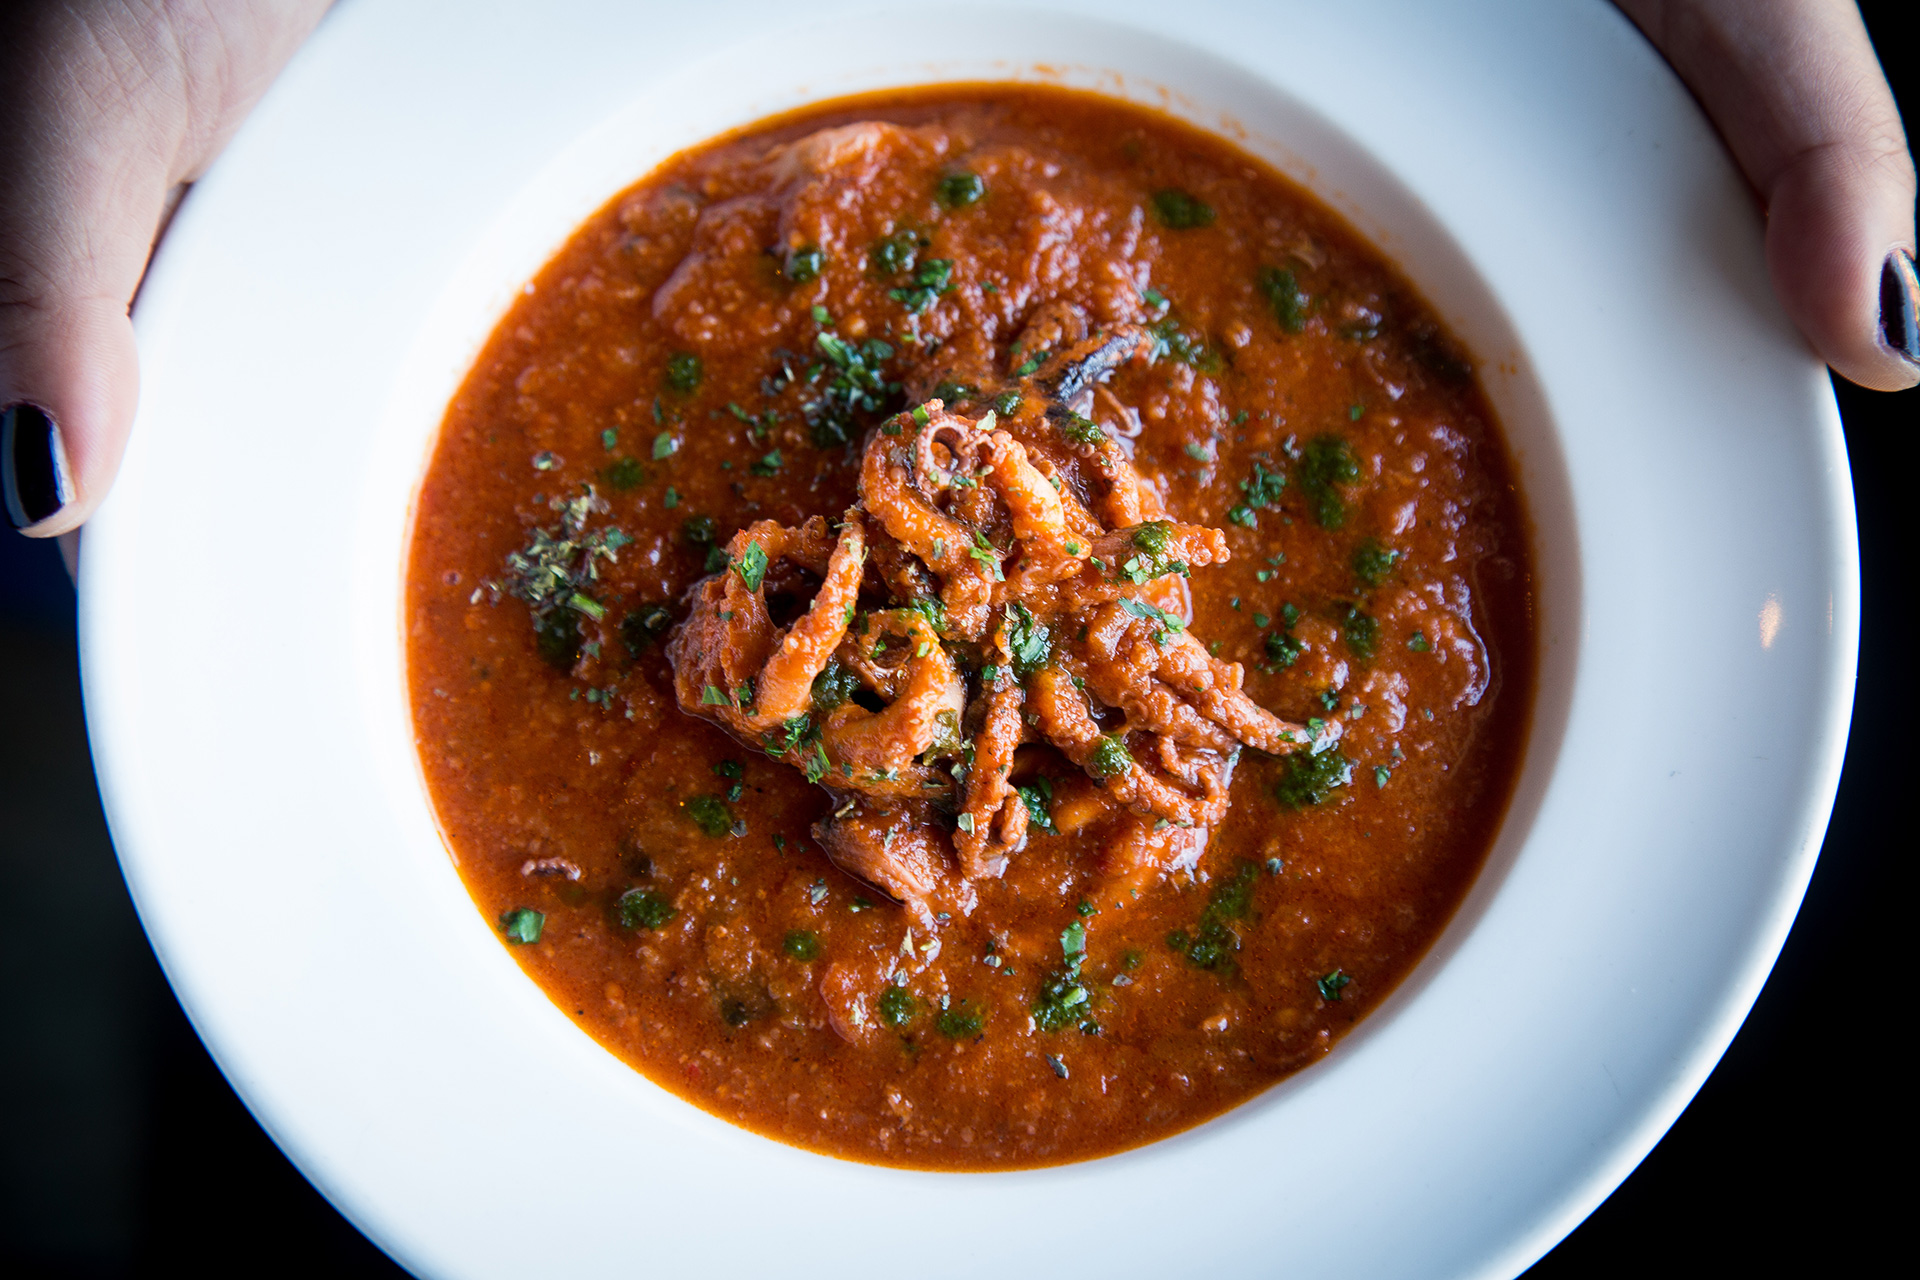 Prupisceddu in Umidu cun Tomatiga (Baby Octopus stew in a spicy Tomato Sauce)